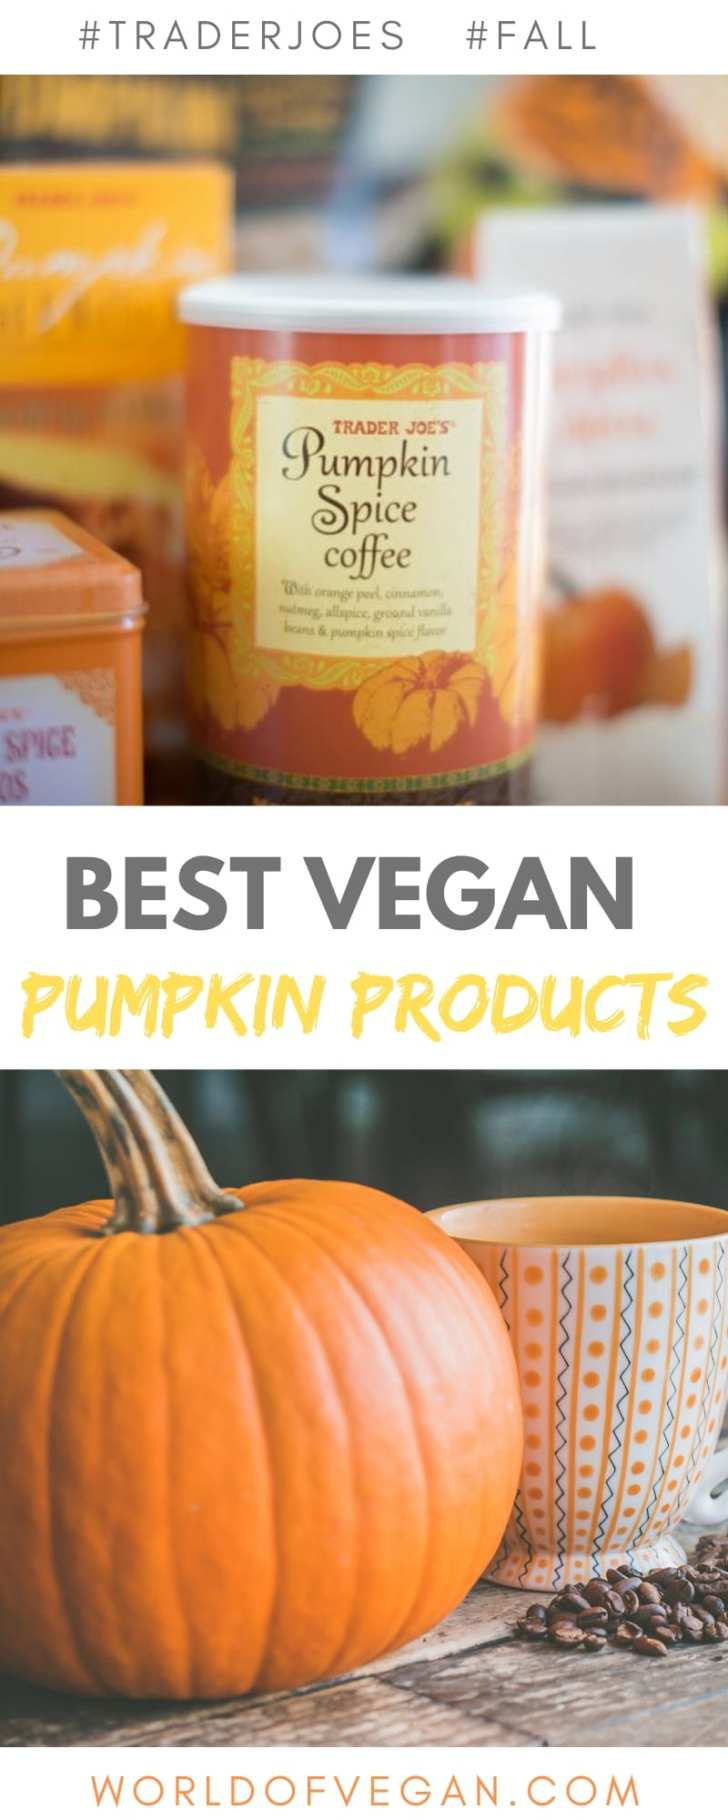 10 Best Vegan Pumpkin Products at Trader Joe's   World of Vegan   #pumpkin #vegan #products #tradejoes #shopping #guide #worldofvegan